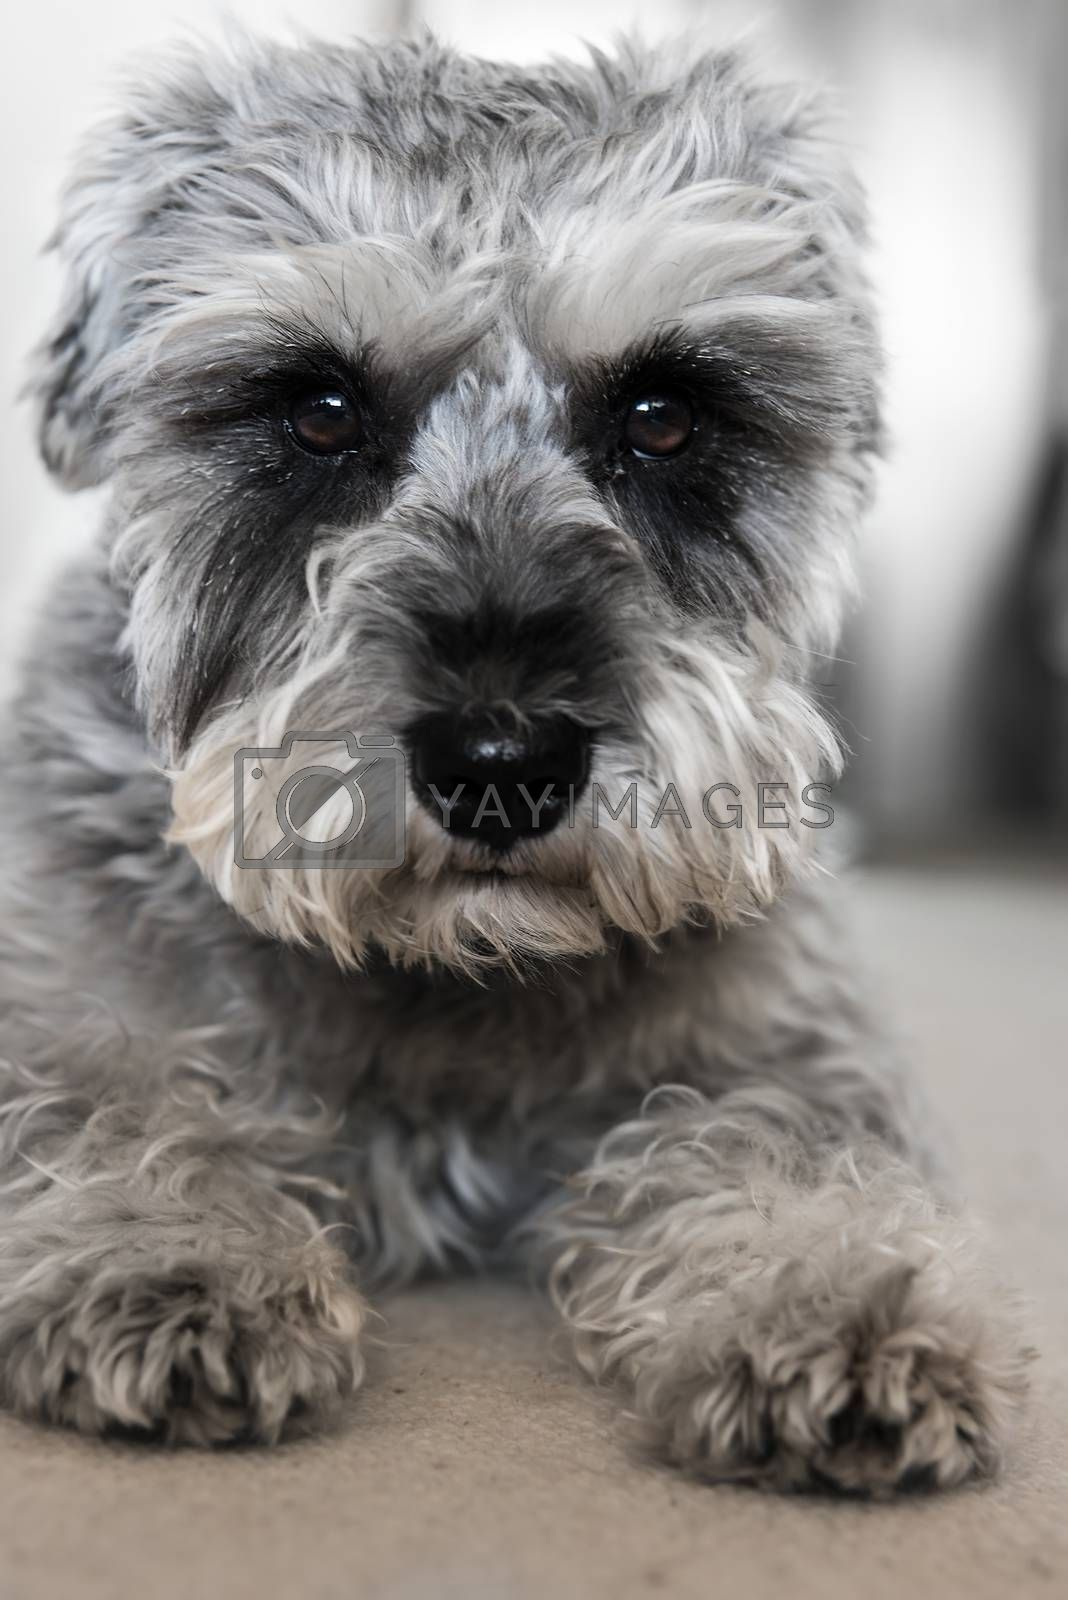 Puppy miniature schnauzer lies on the floor, funny dog